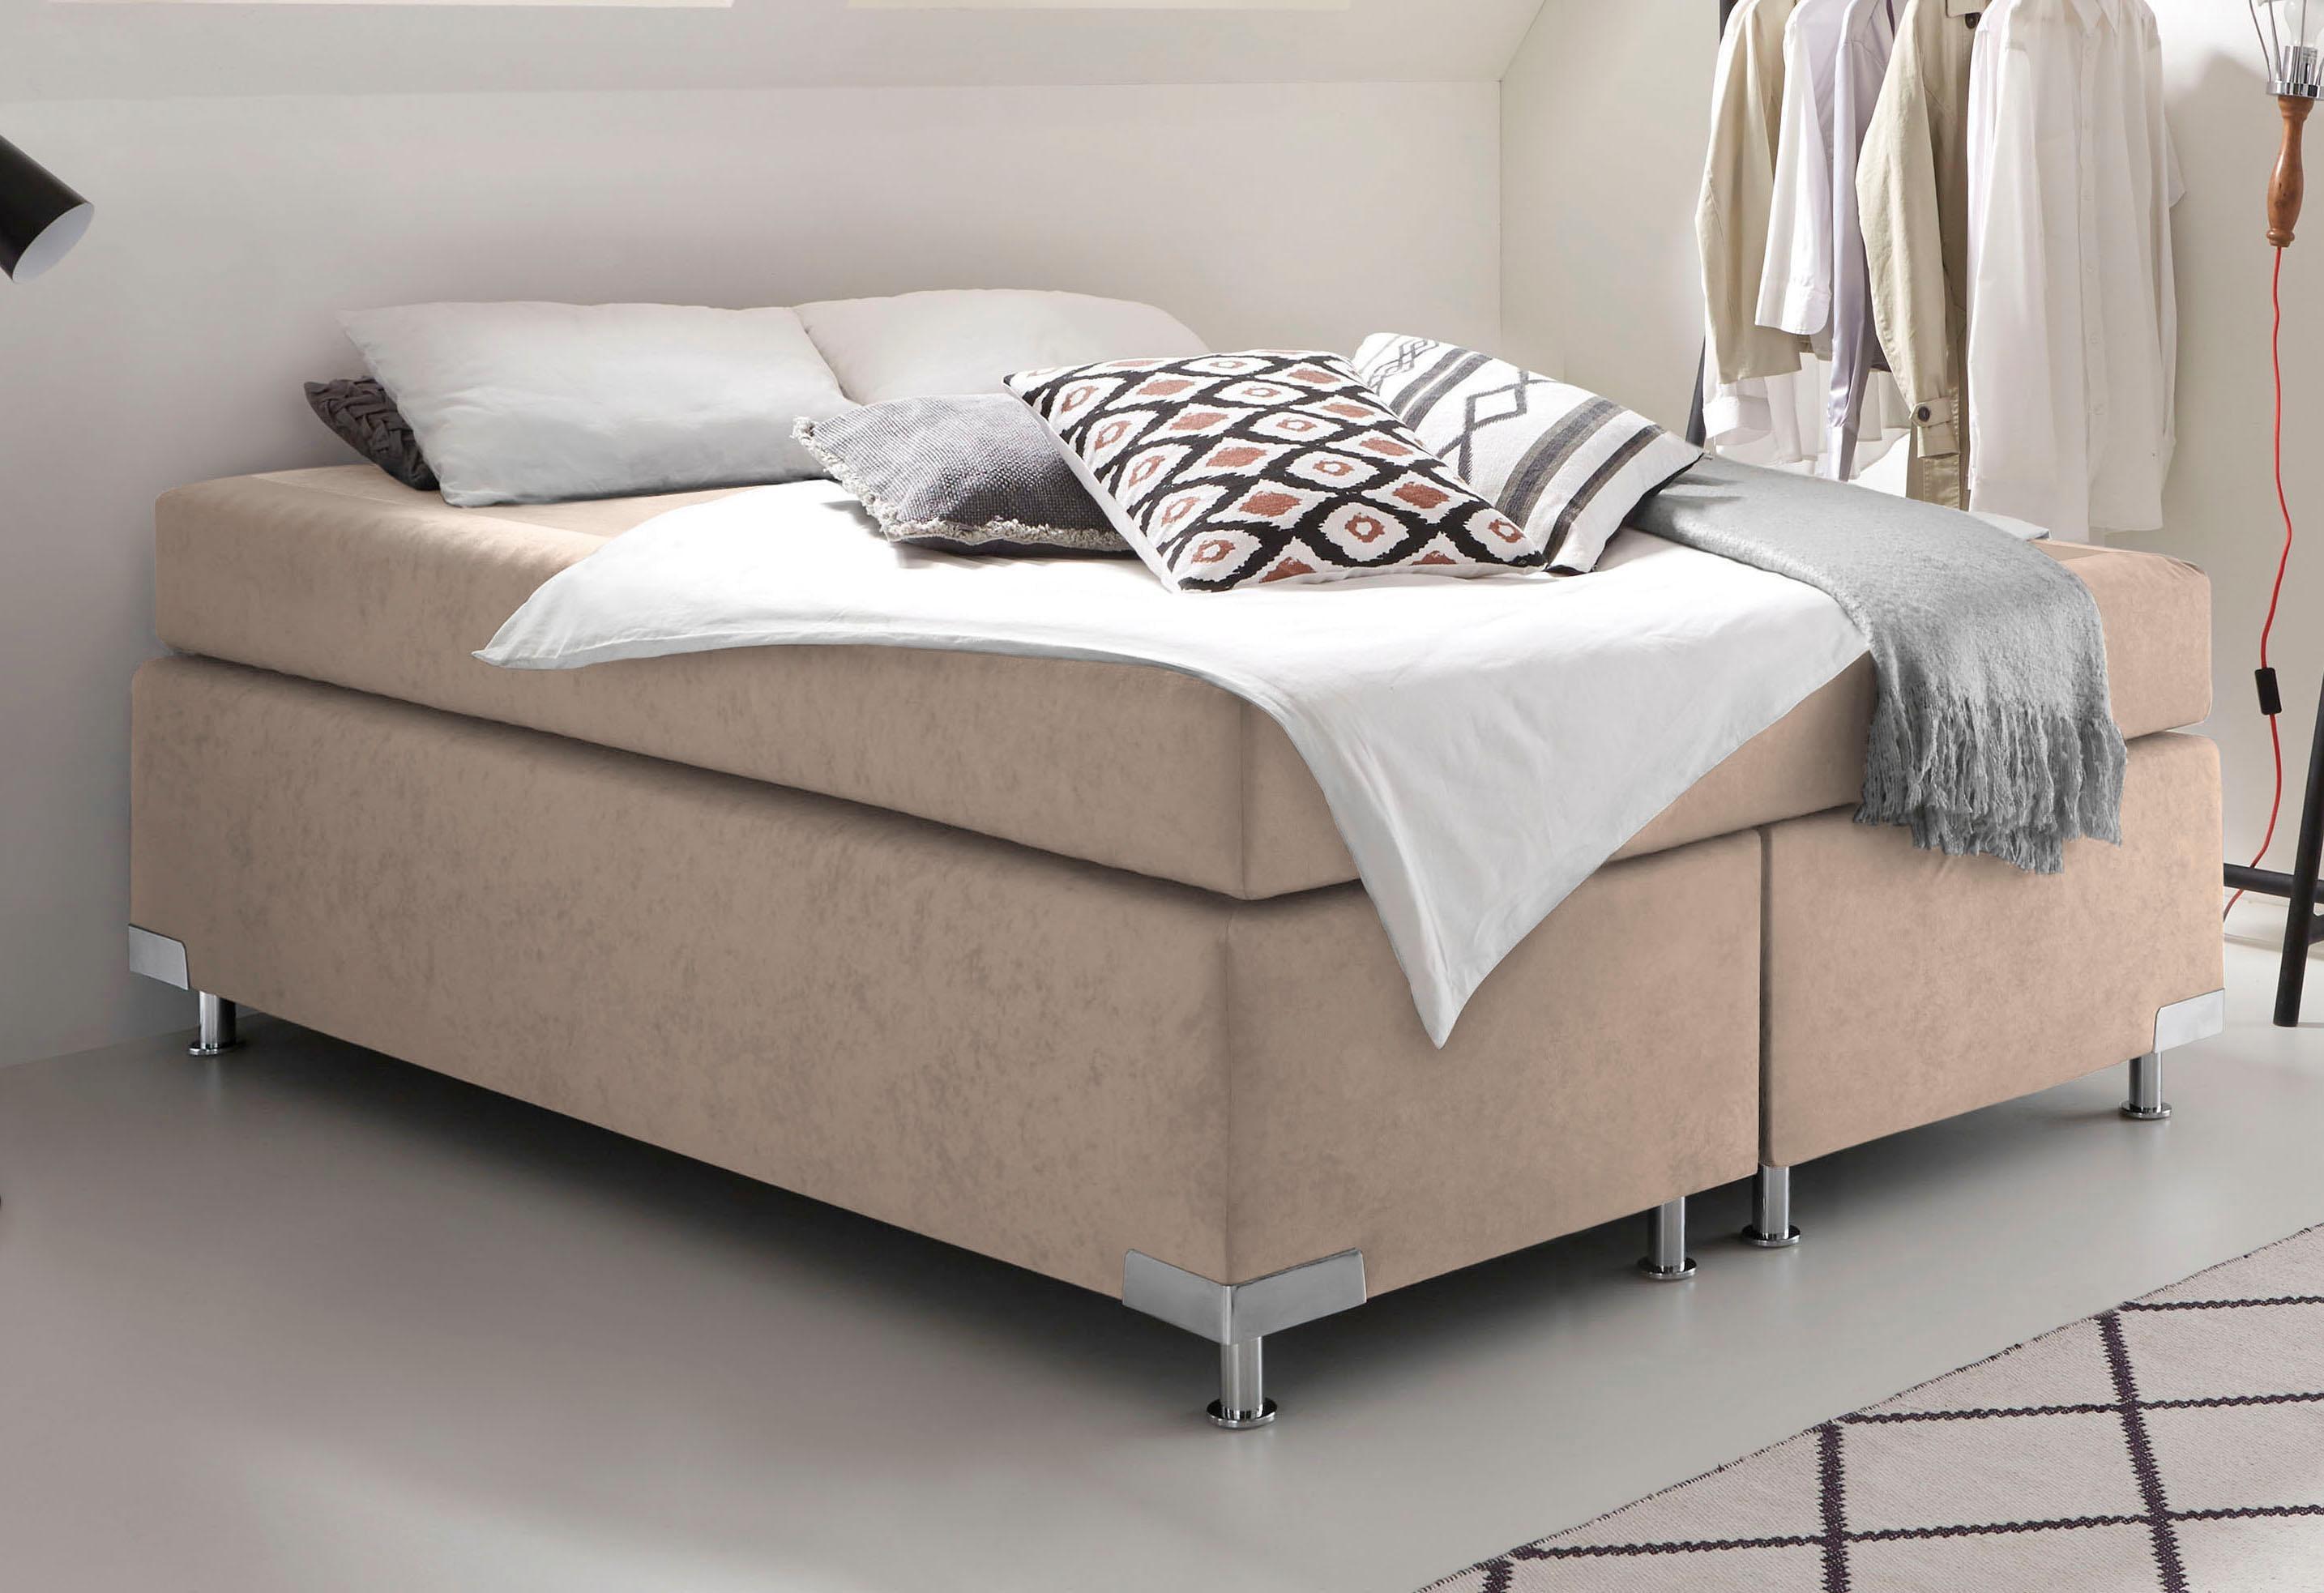 westfalia schlafkomfort boxspringbett ohne kopfteil frei